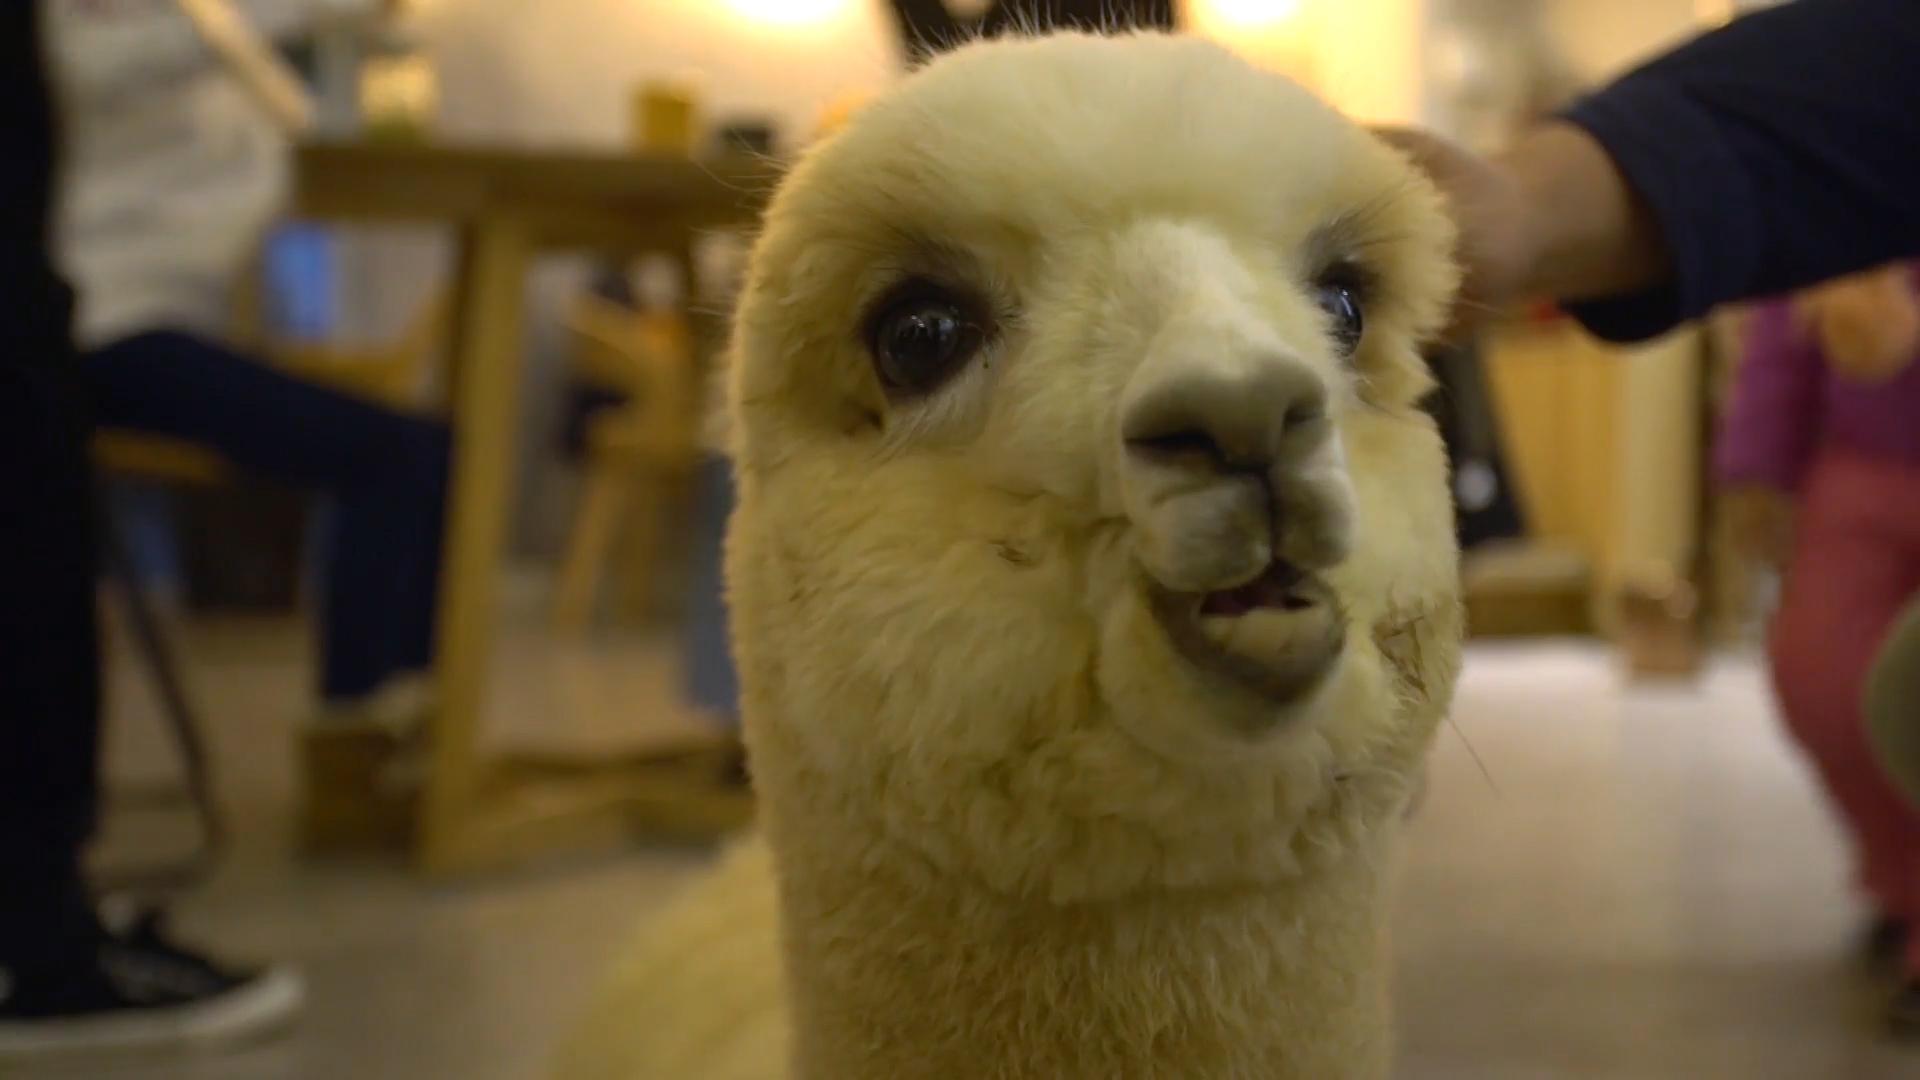 Baby alpacas in Chinese restaurant bring joy to customers